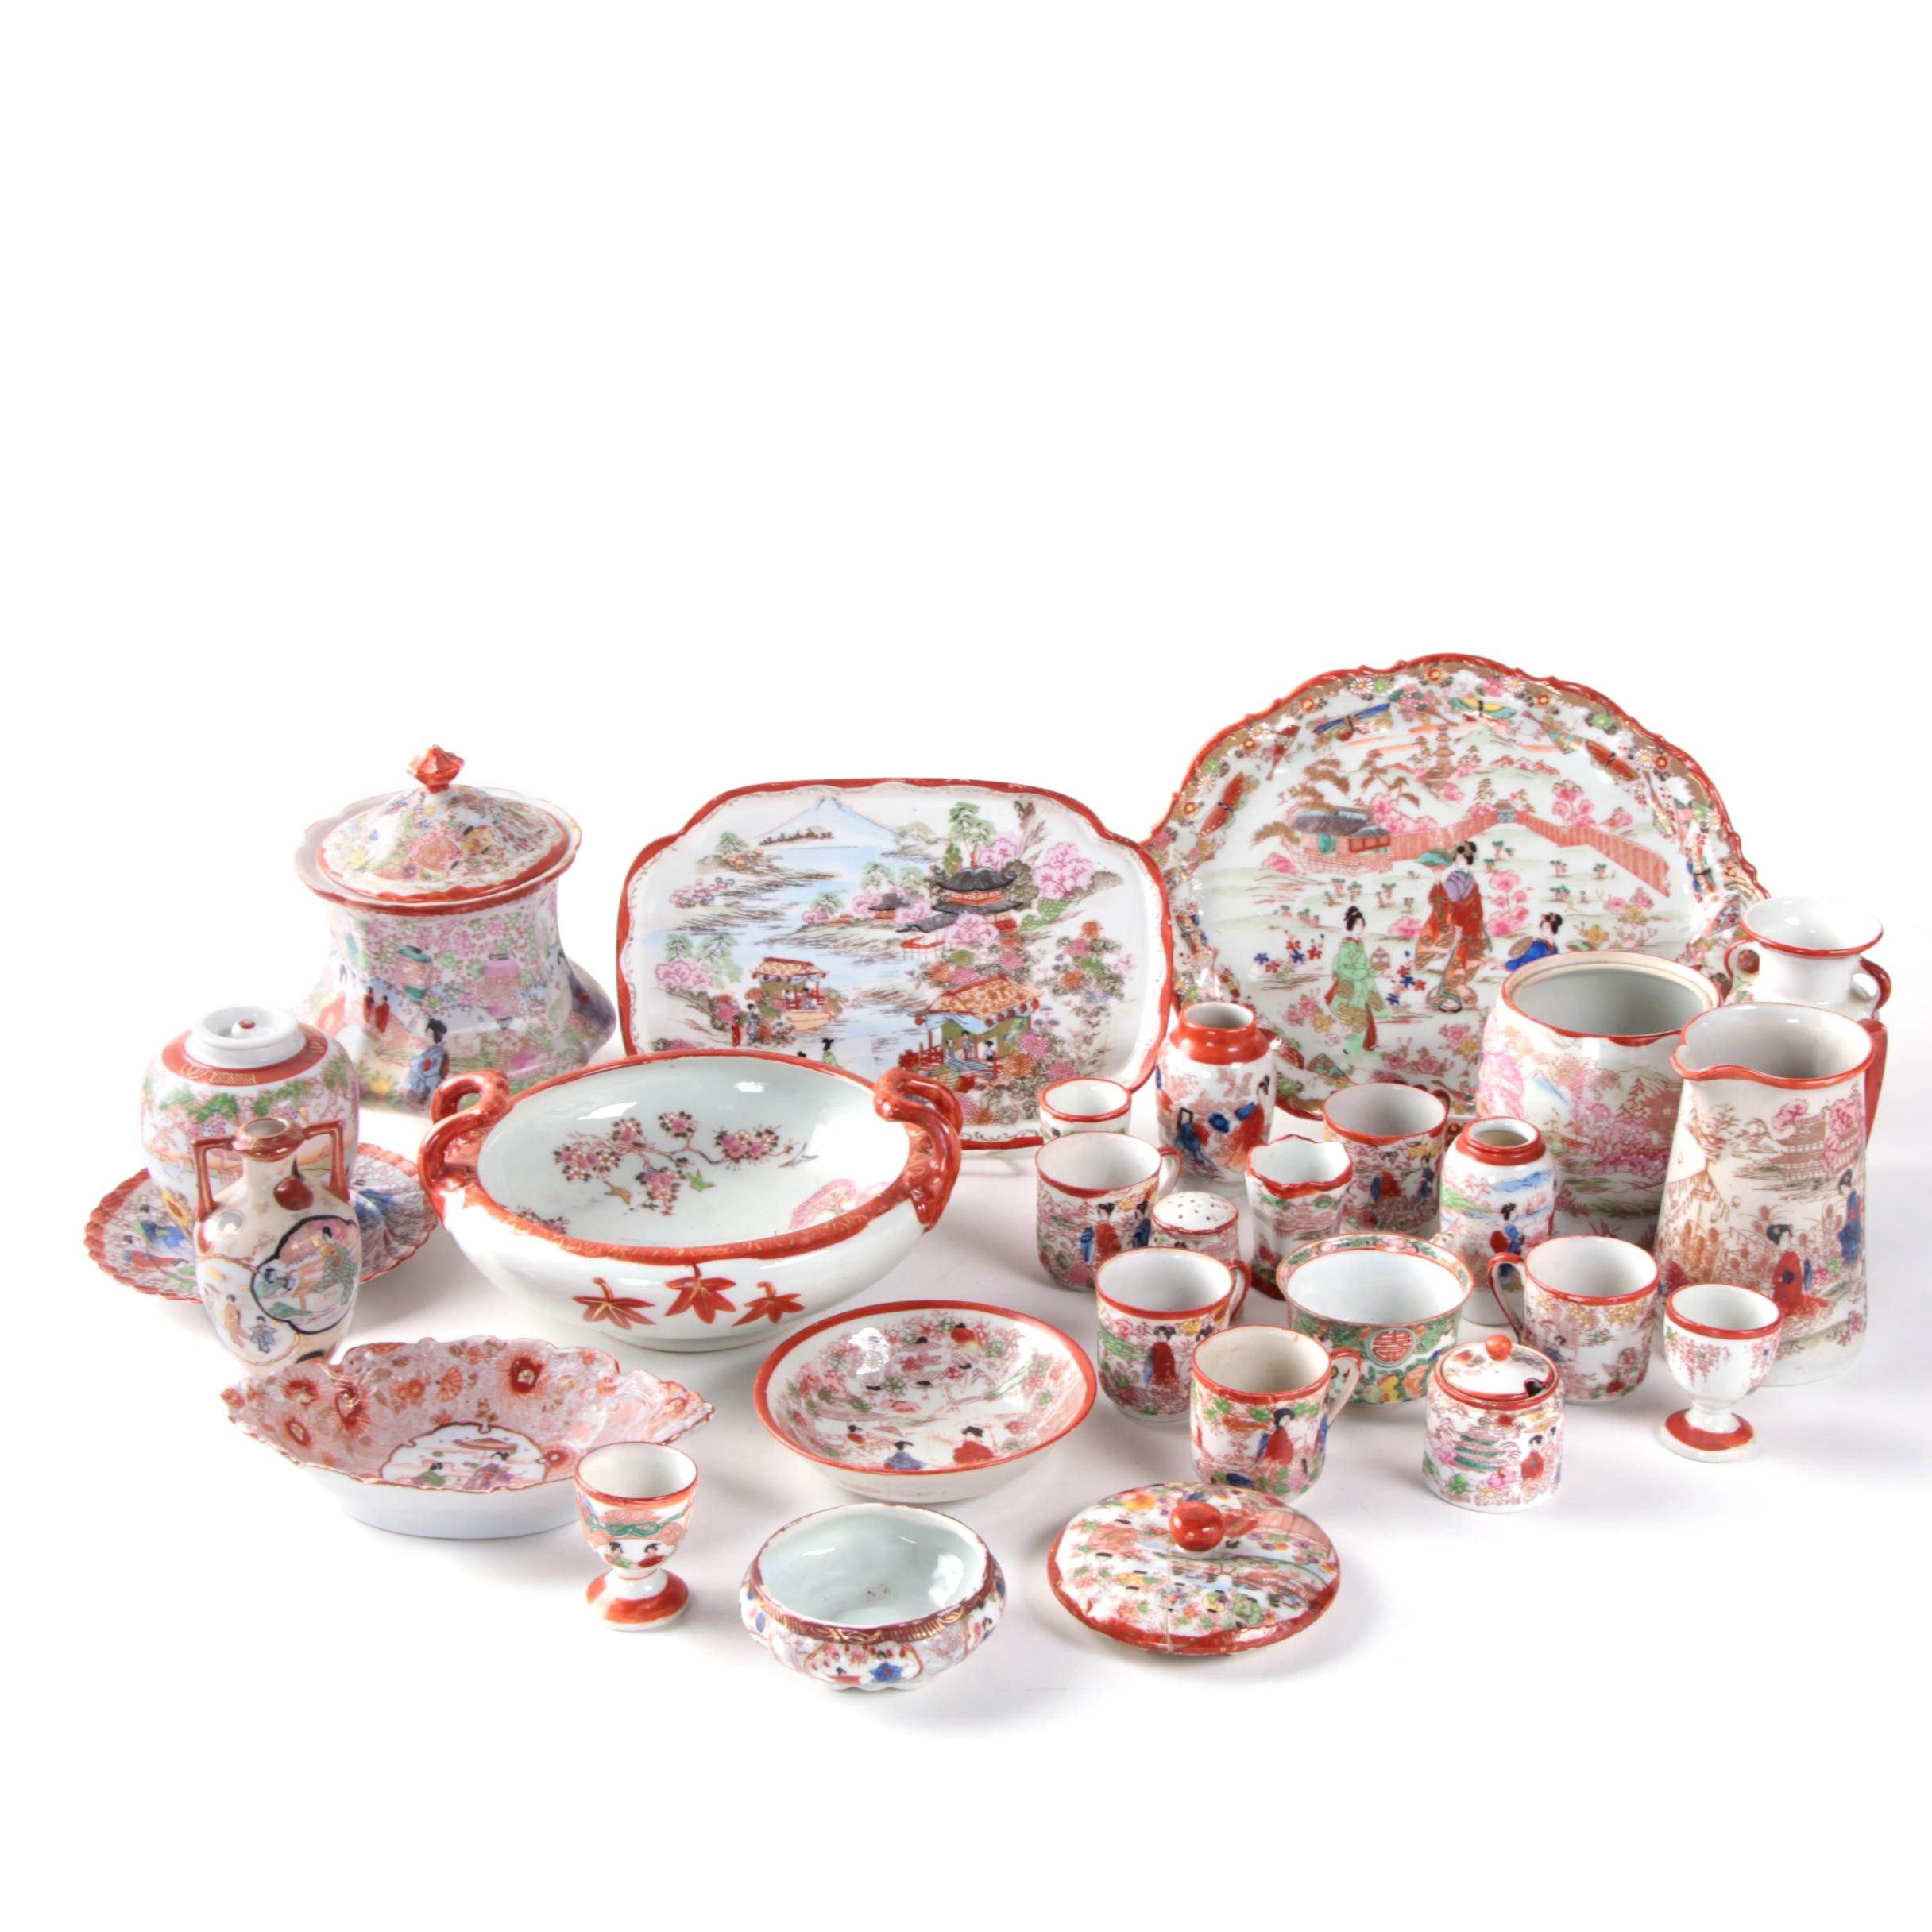 "Vintage Japanese ""Geisha Girl"" Porcelain Vases and Serveware"